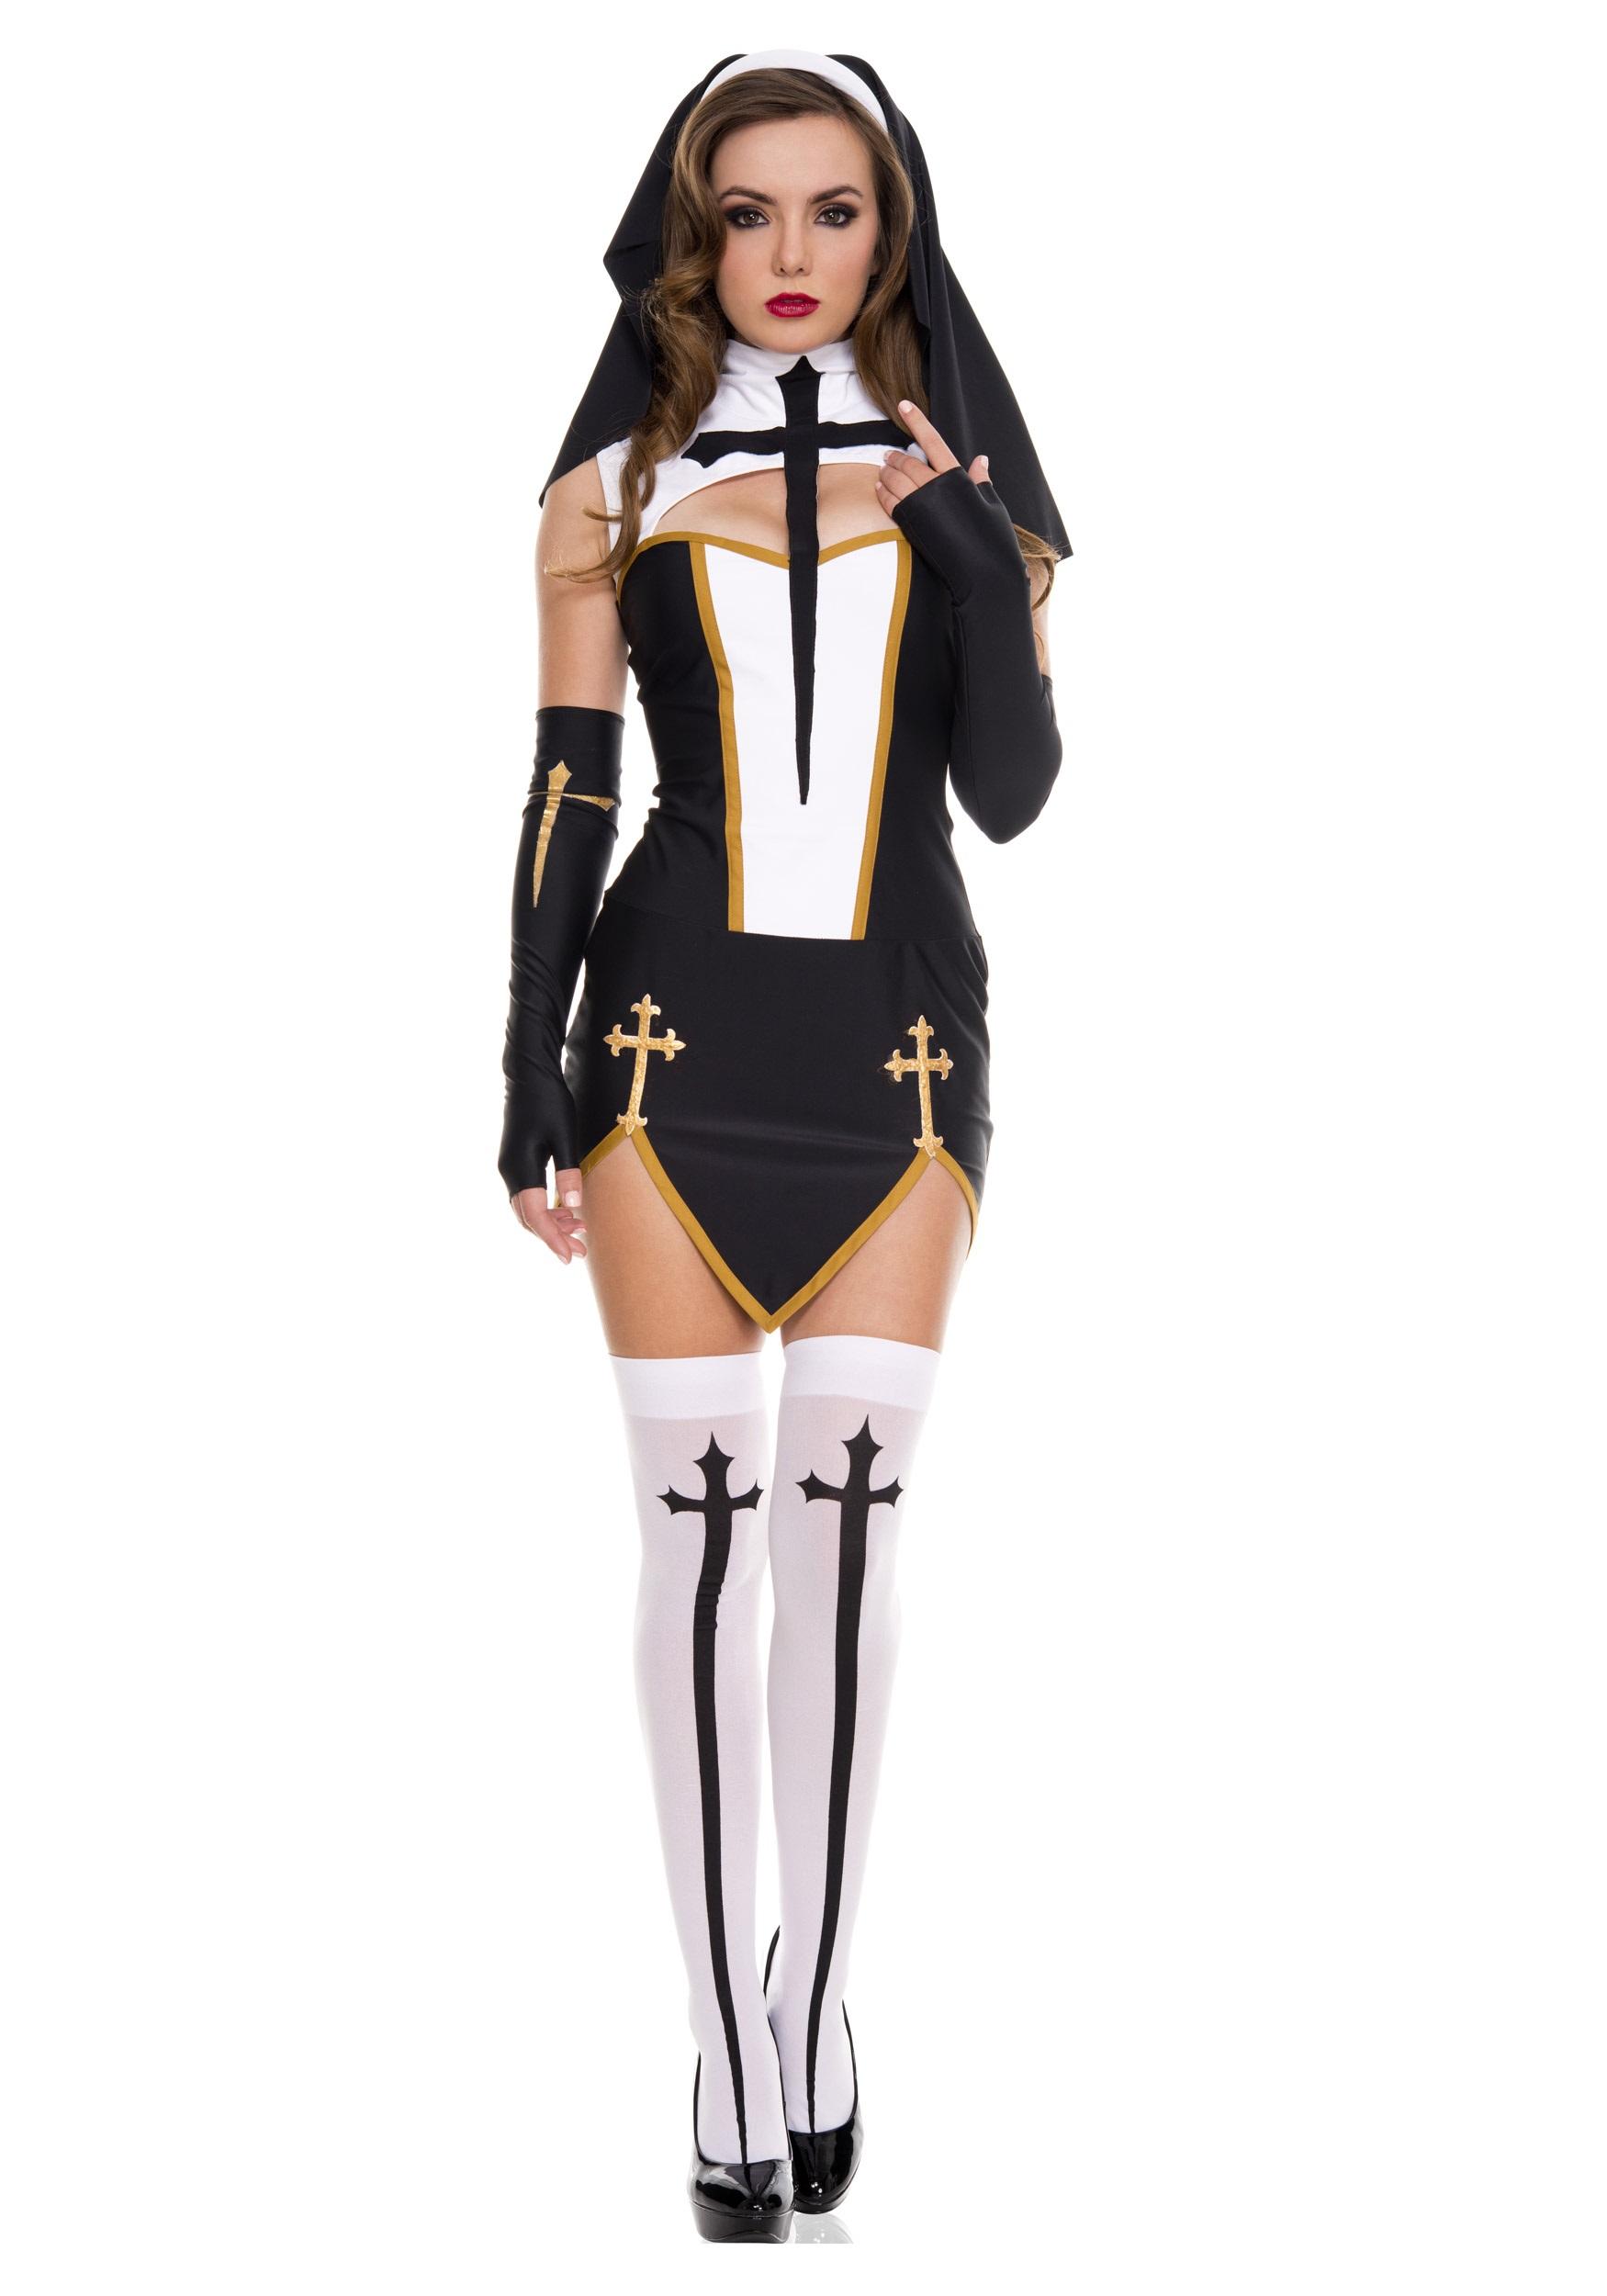 Bad Habit Nun Costume - Halloween Costumes